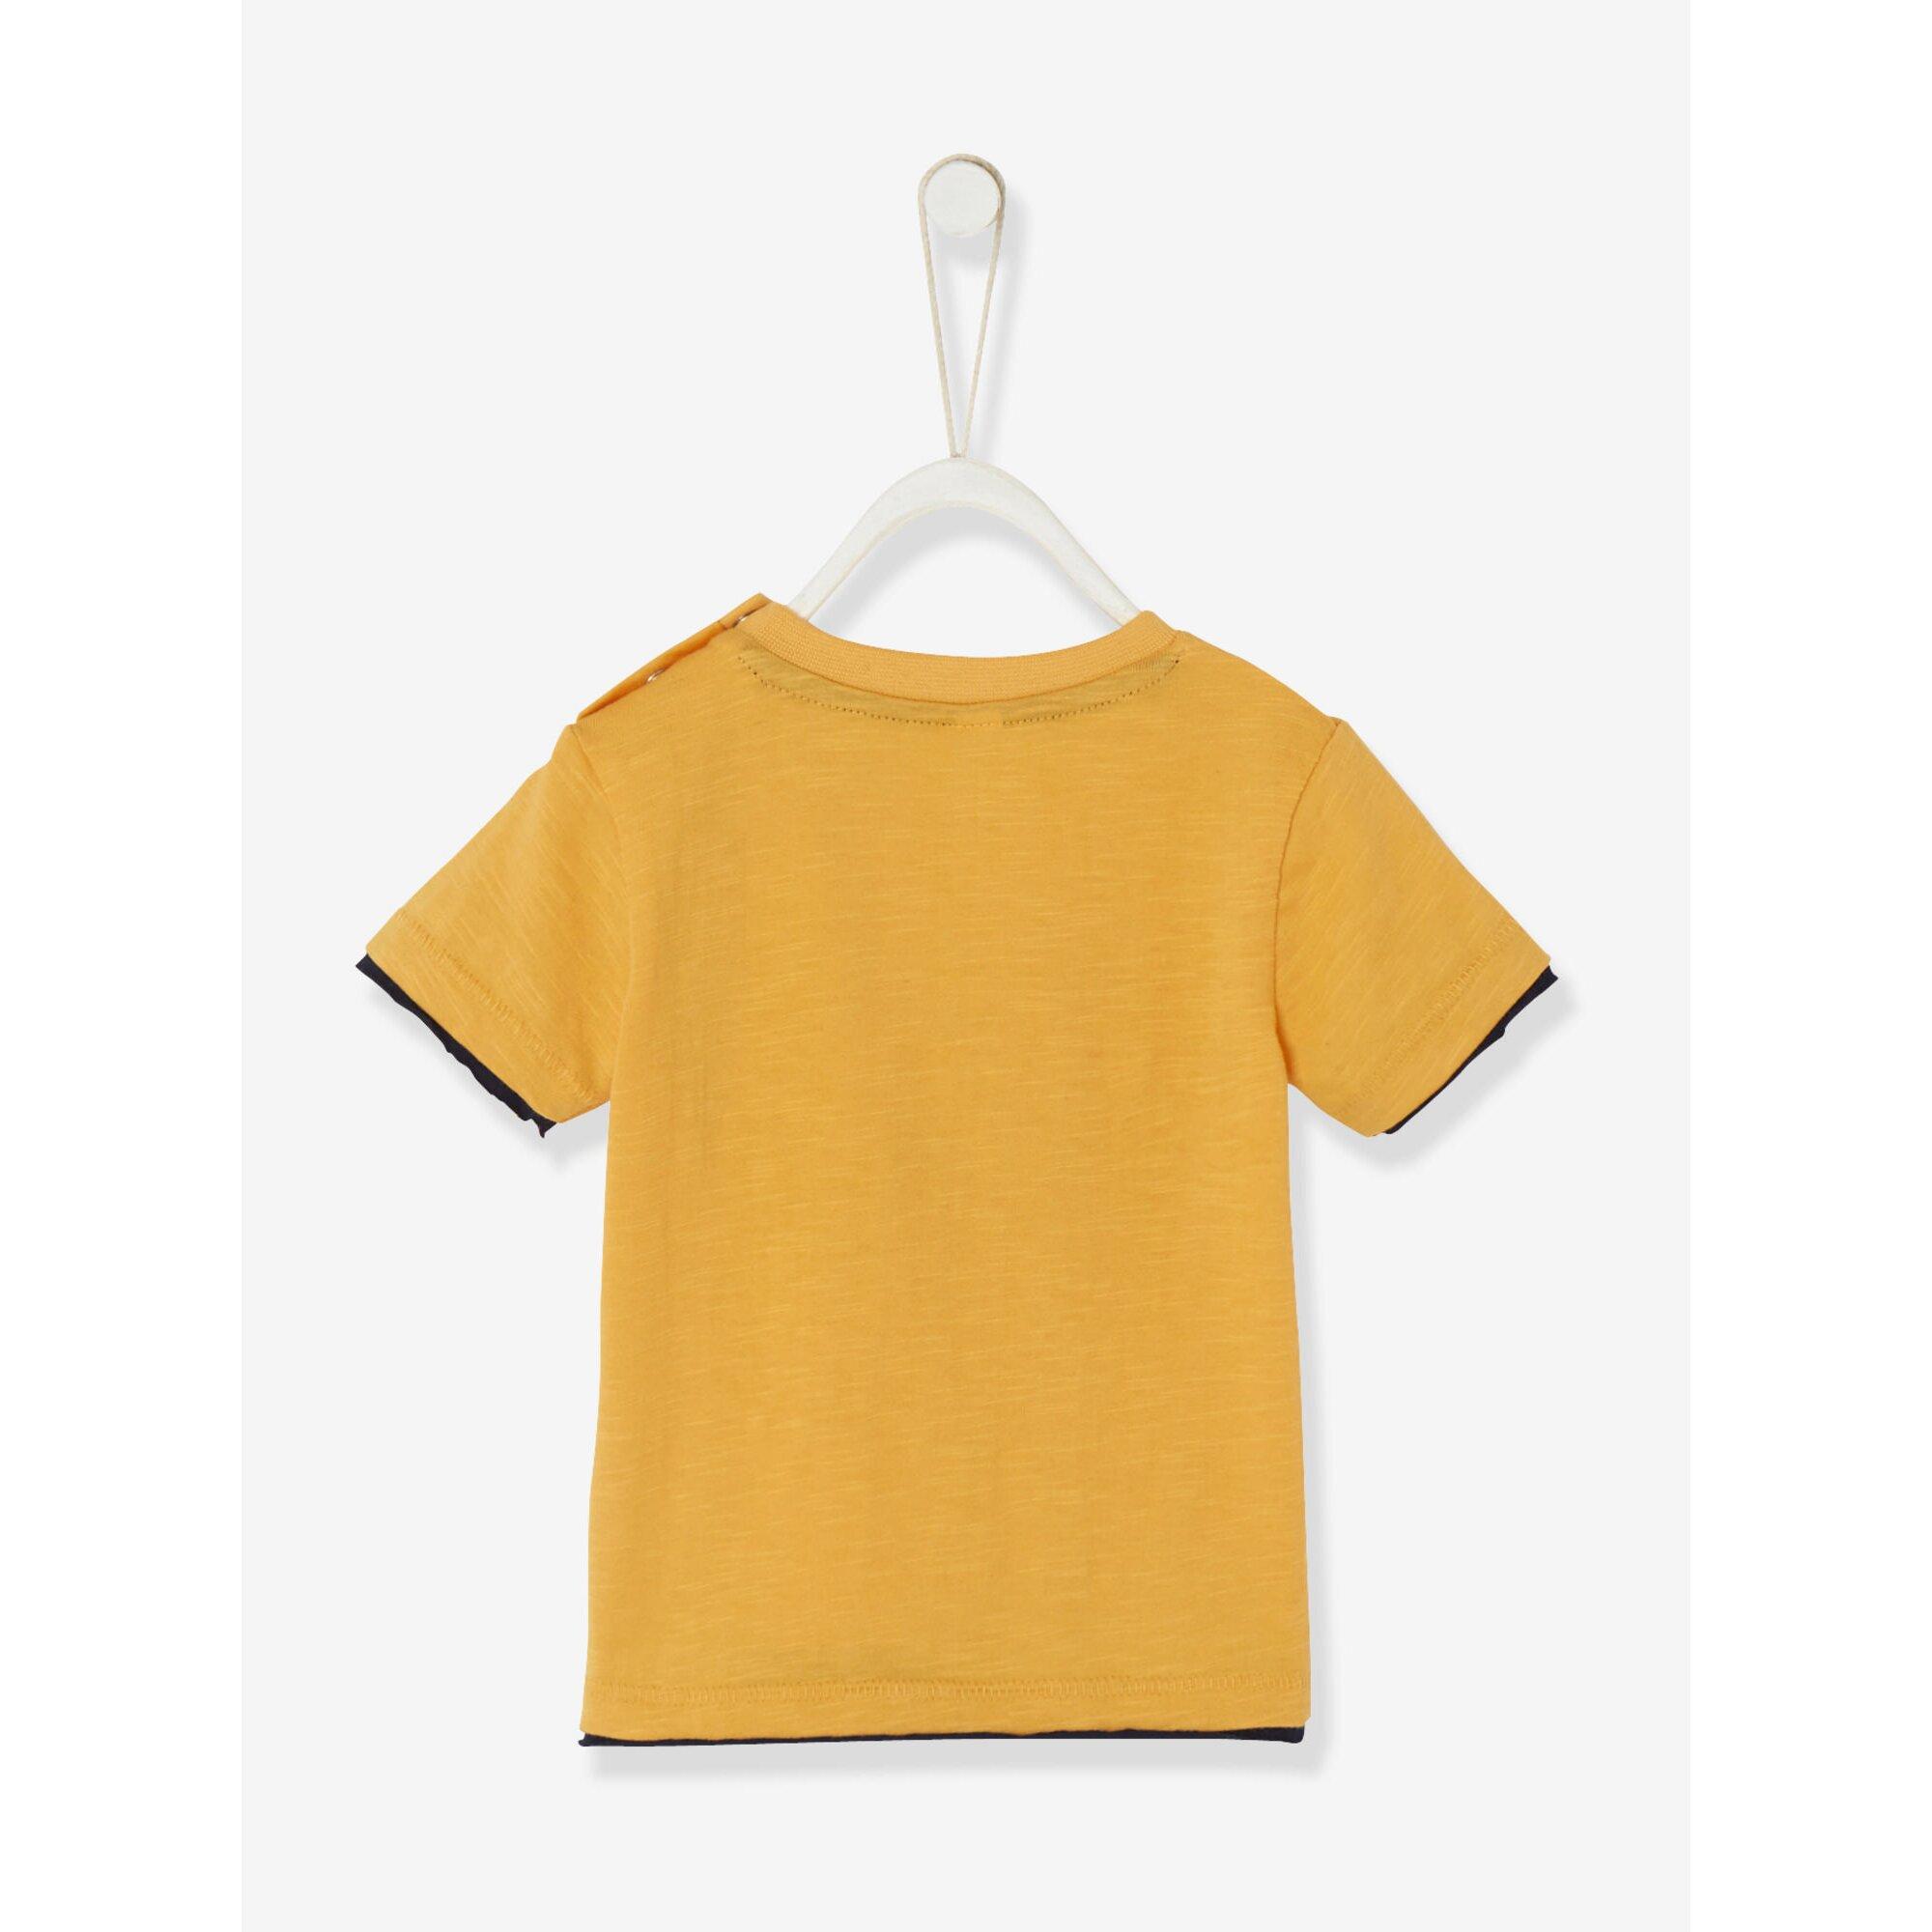 vertbaudet-baby-jungen-t-shirt-cornelius-fantastic-